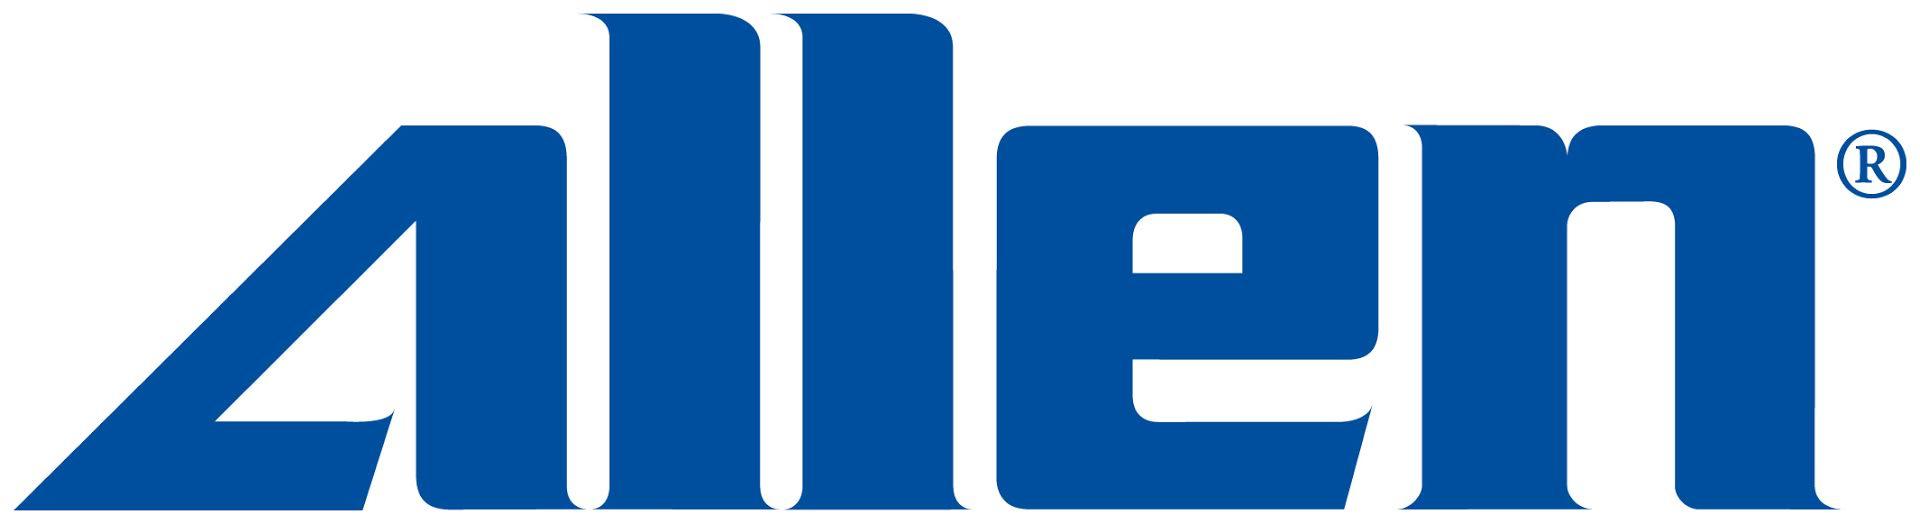 Allen Medical logo